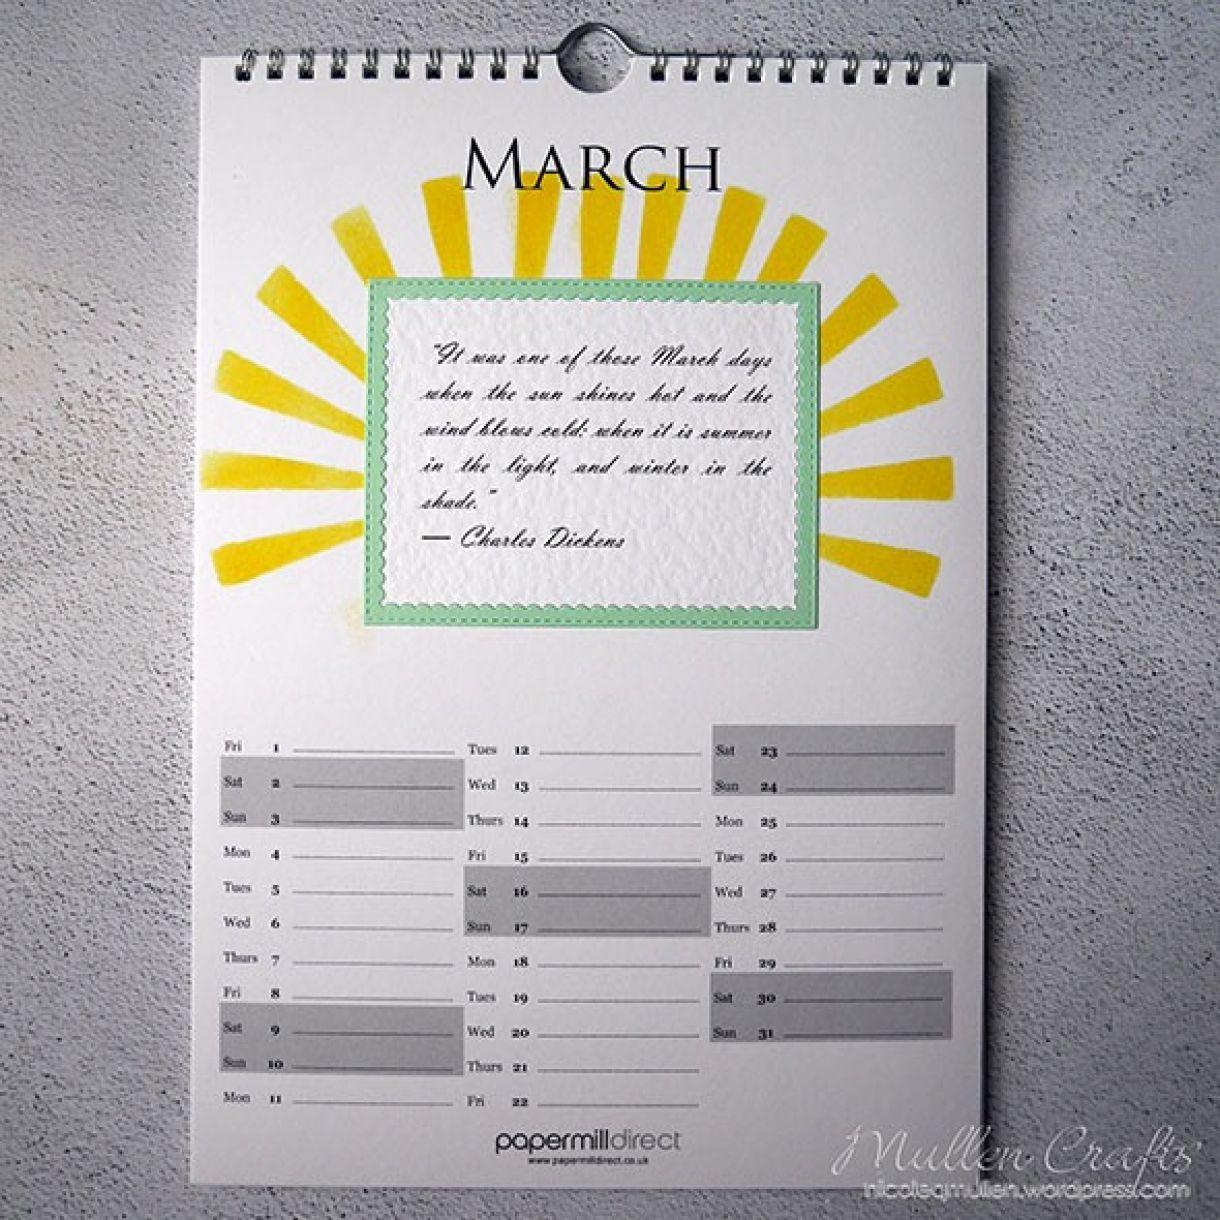 Nicole Calendar Page March 1